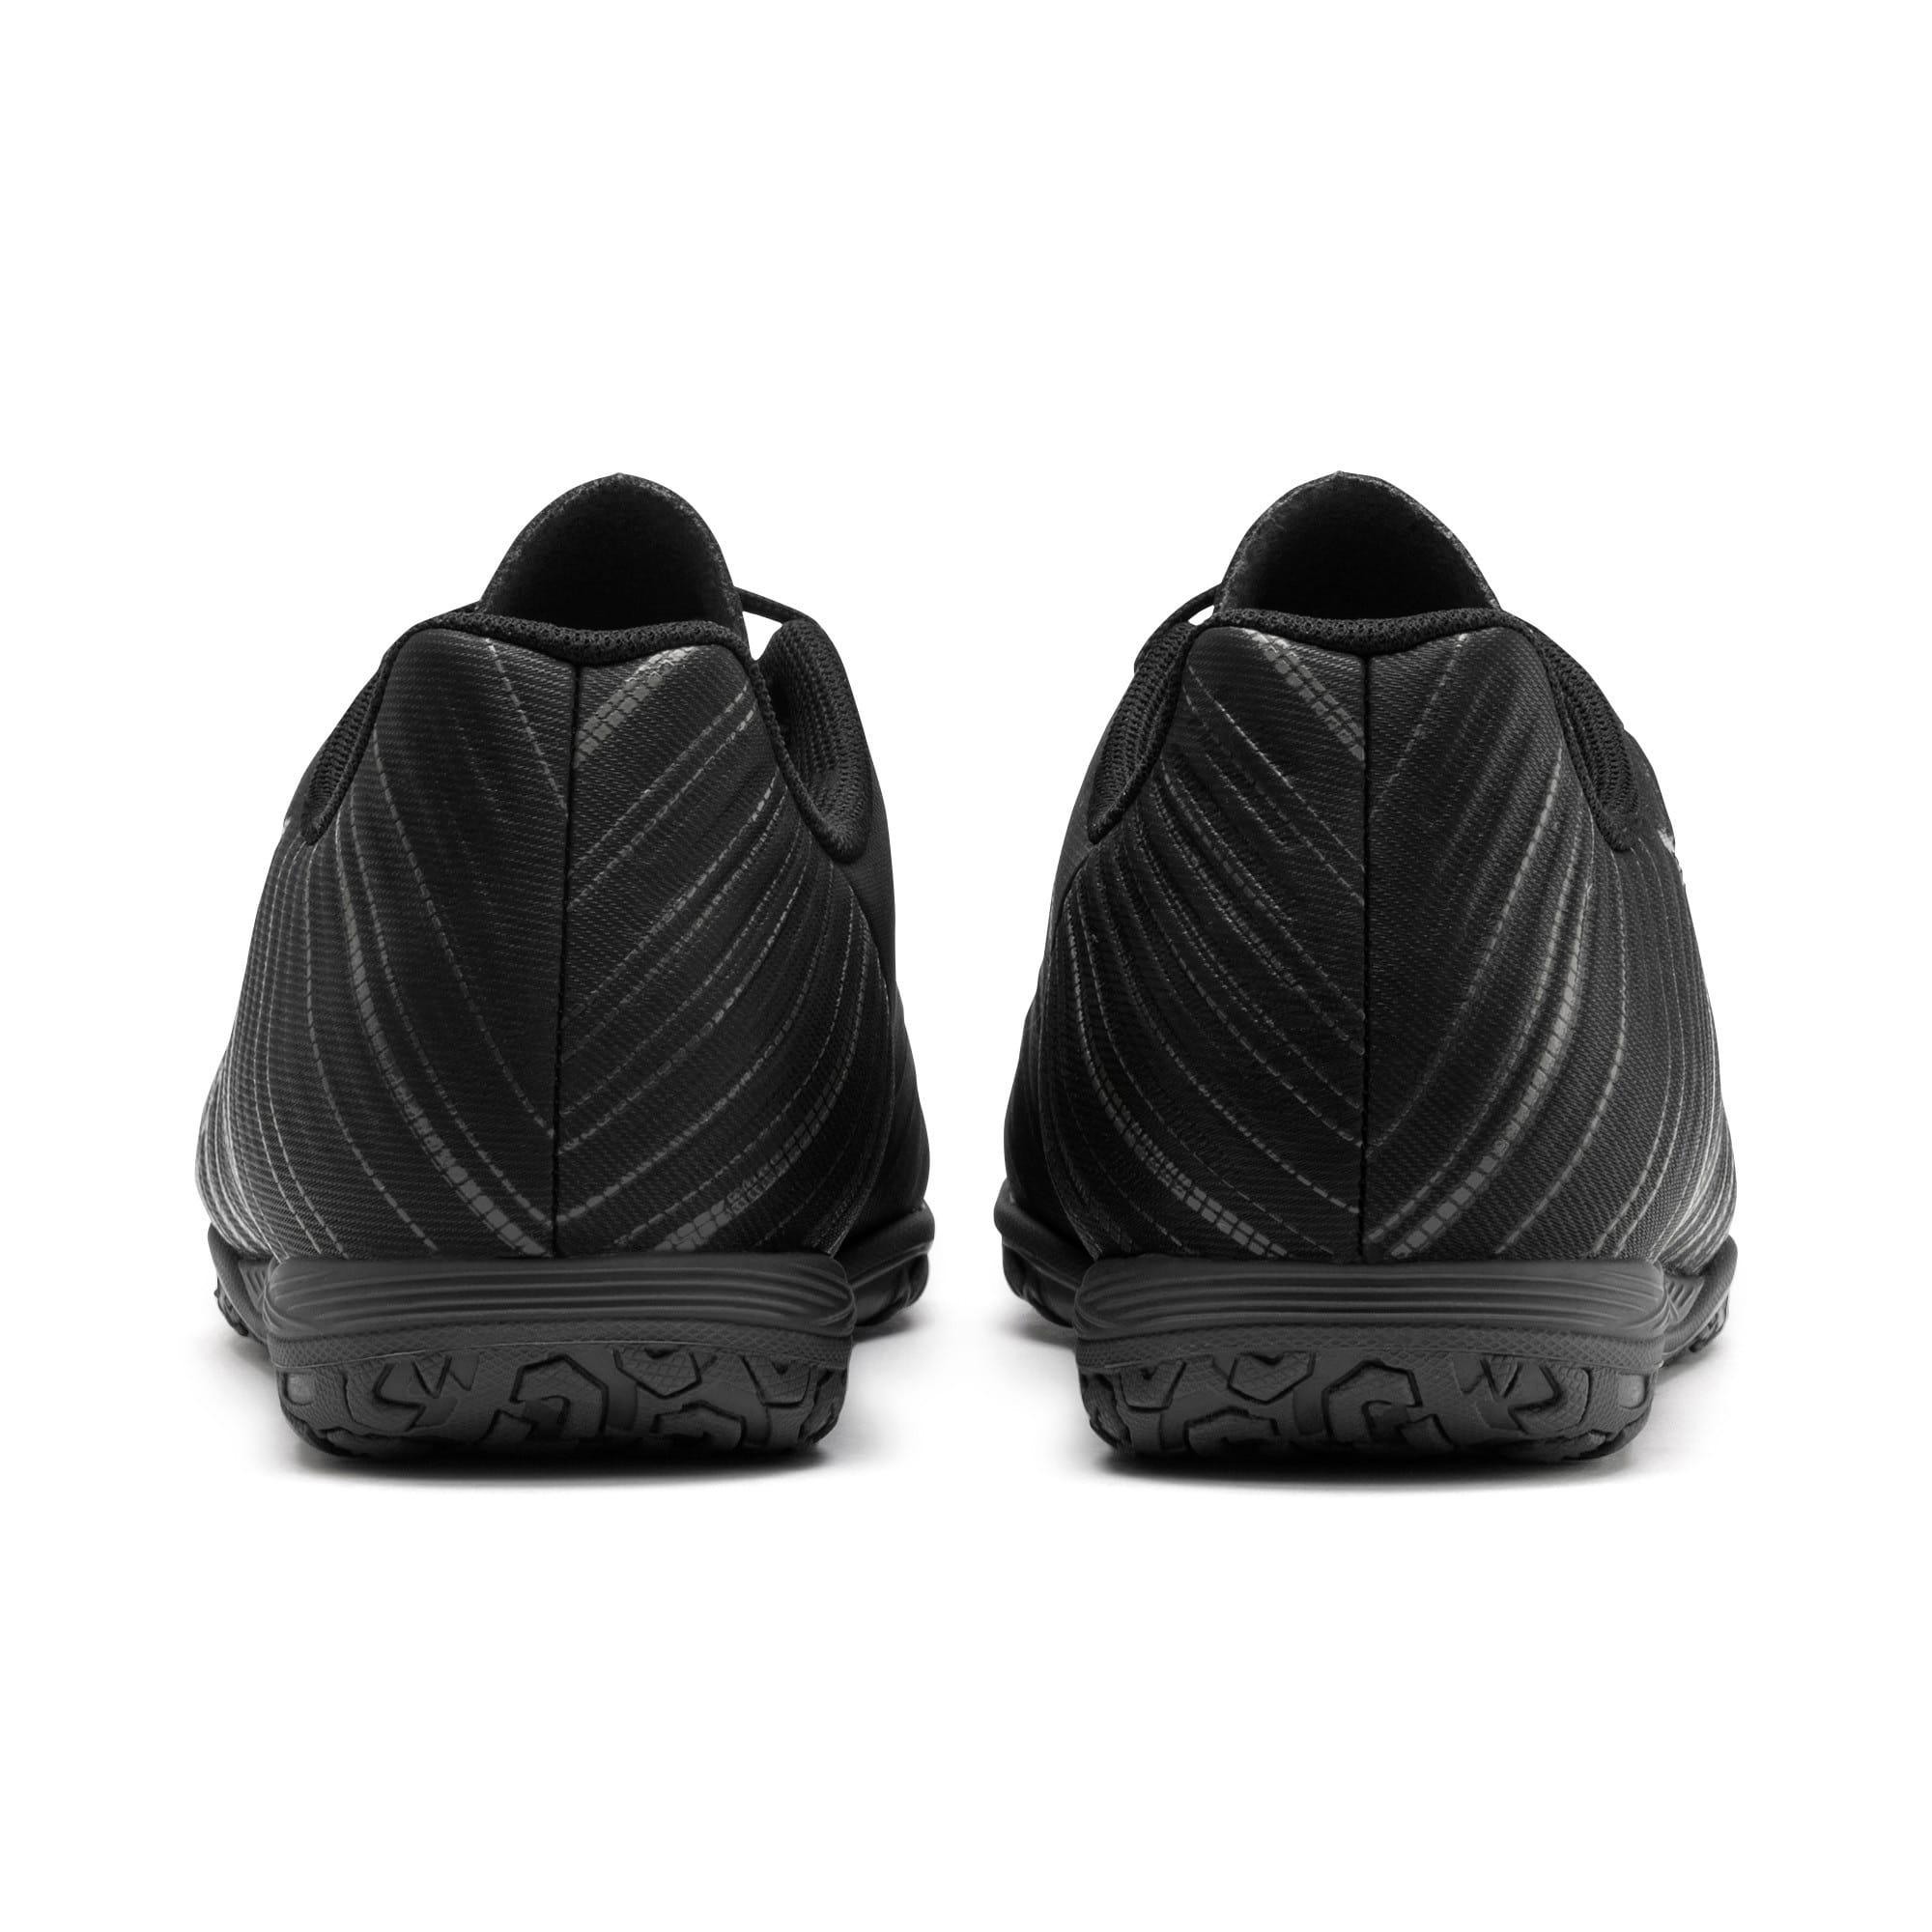 Thumbnail 3 of PUMA ONE 5.4 IT Soccer Shoes JR, Black-Black-Puma Aged Silver, medium